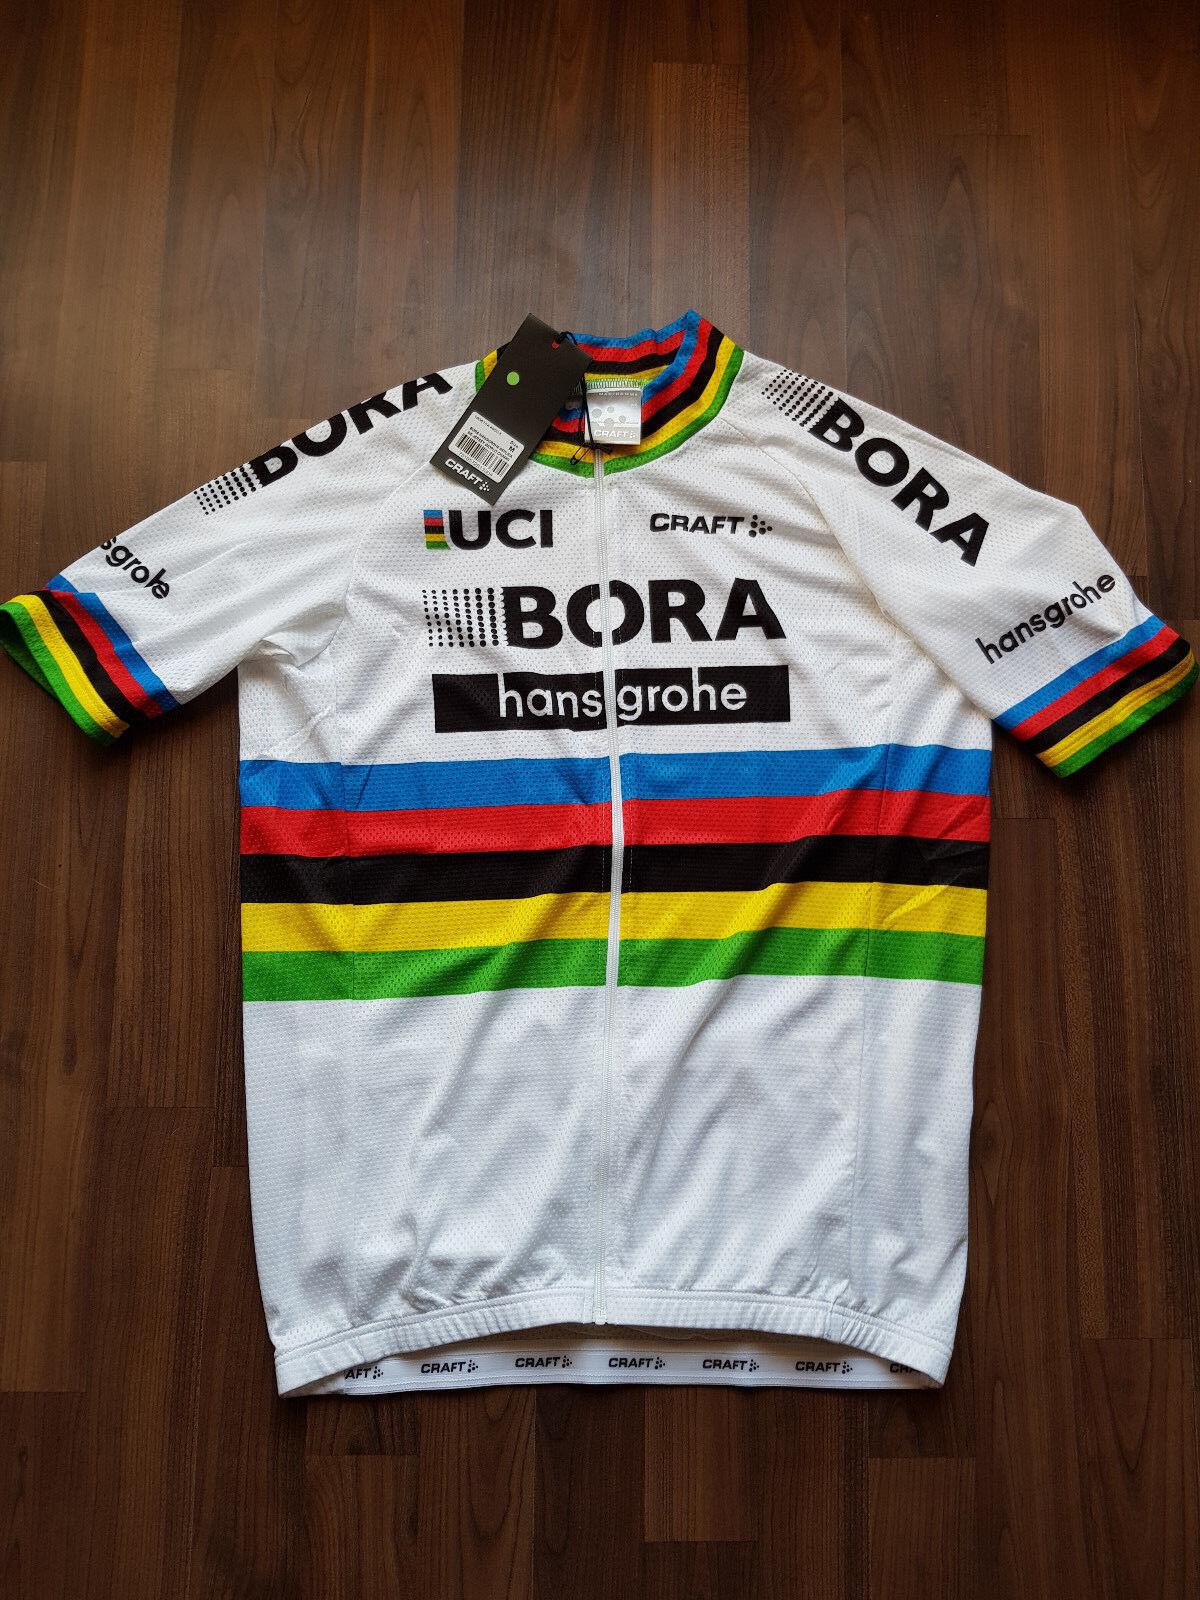 Bora Hans Grohe Peter Sagan Weltmeister Trikot + Hose Set Craft Größe XXXL -NEU-